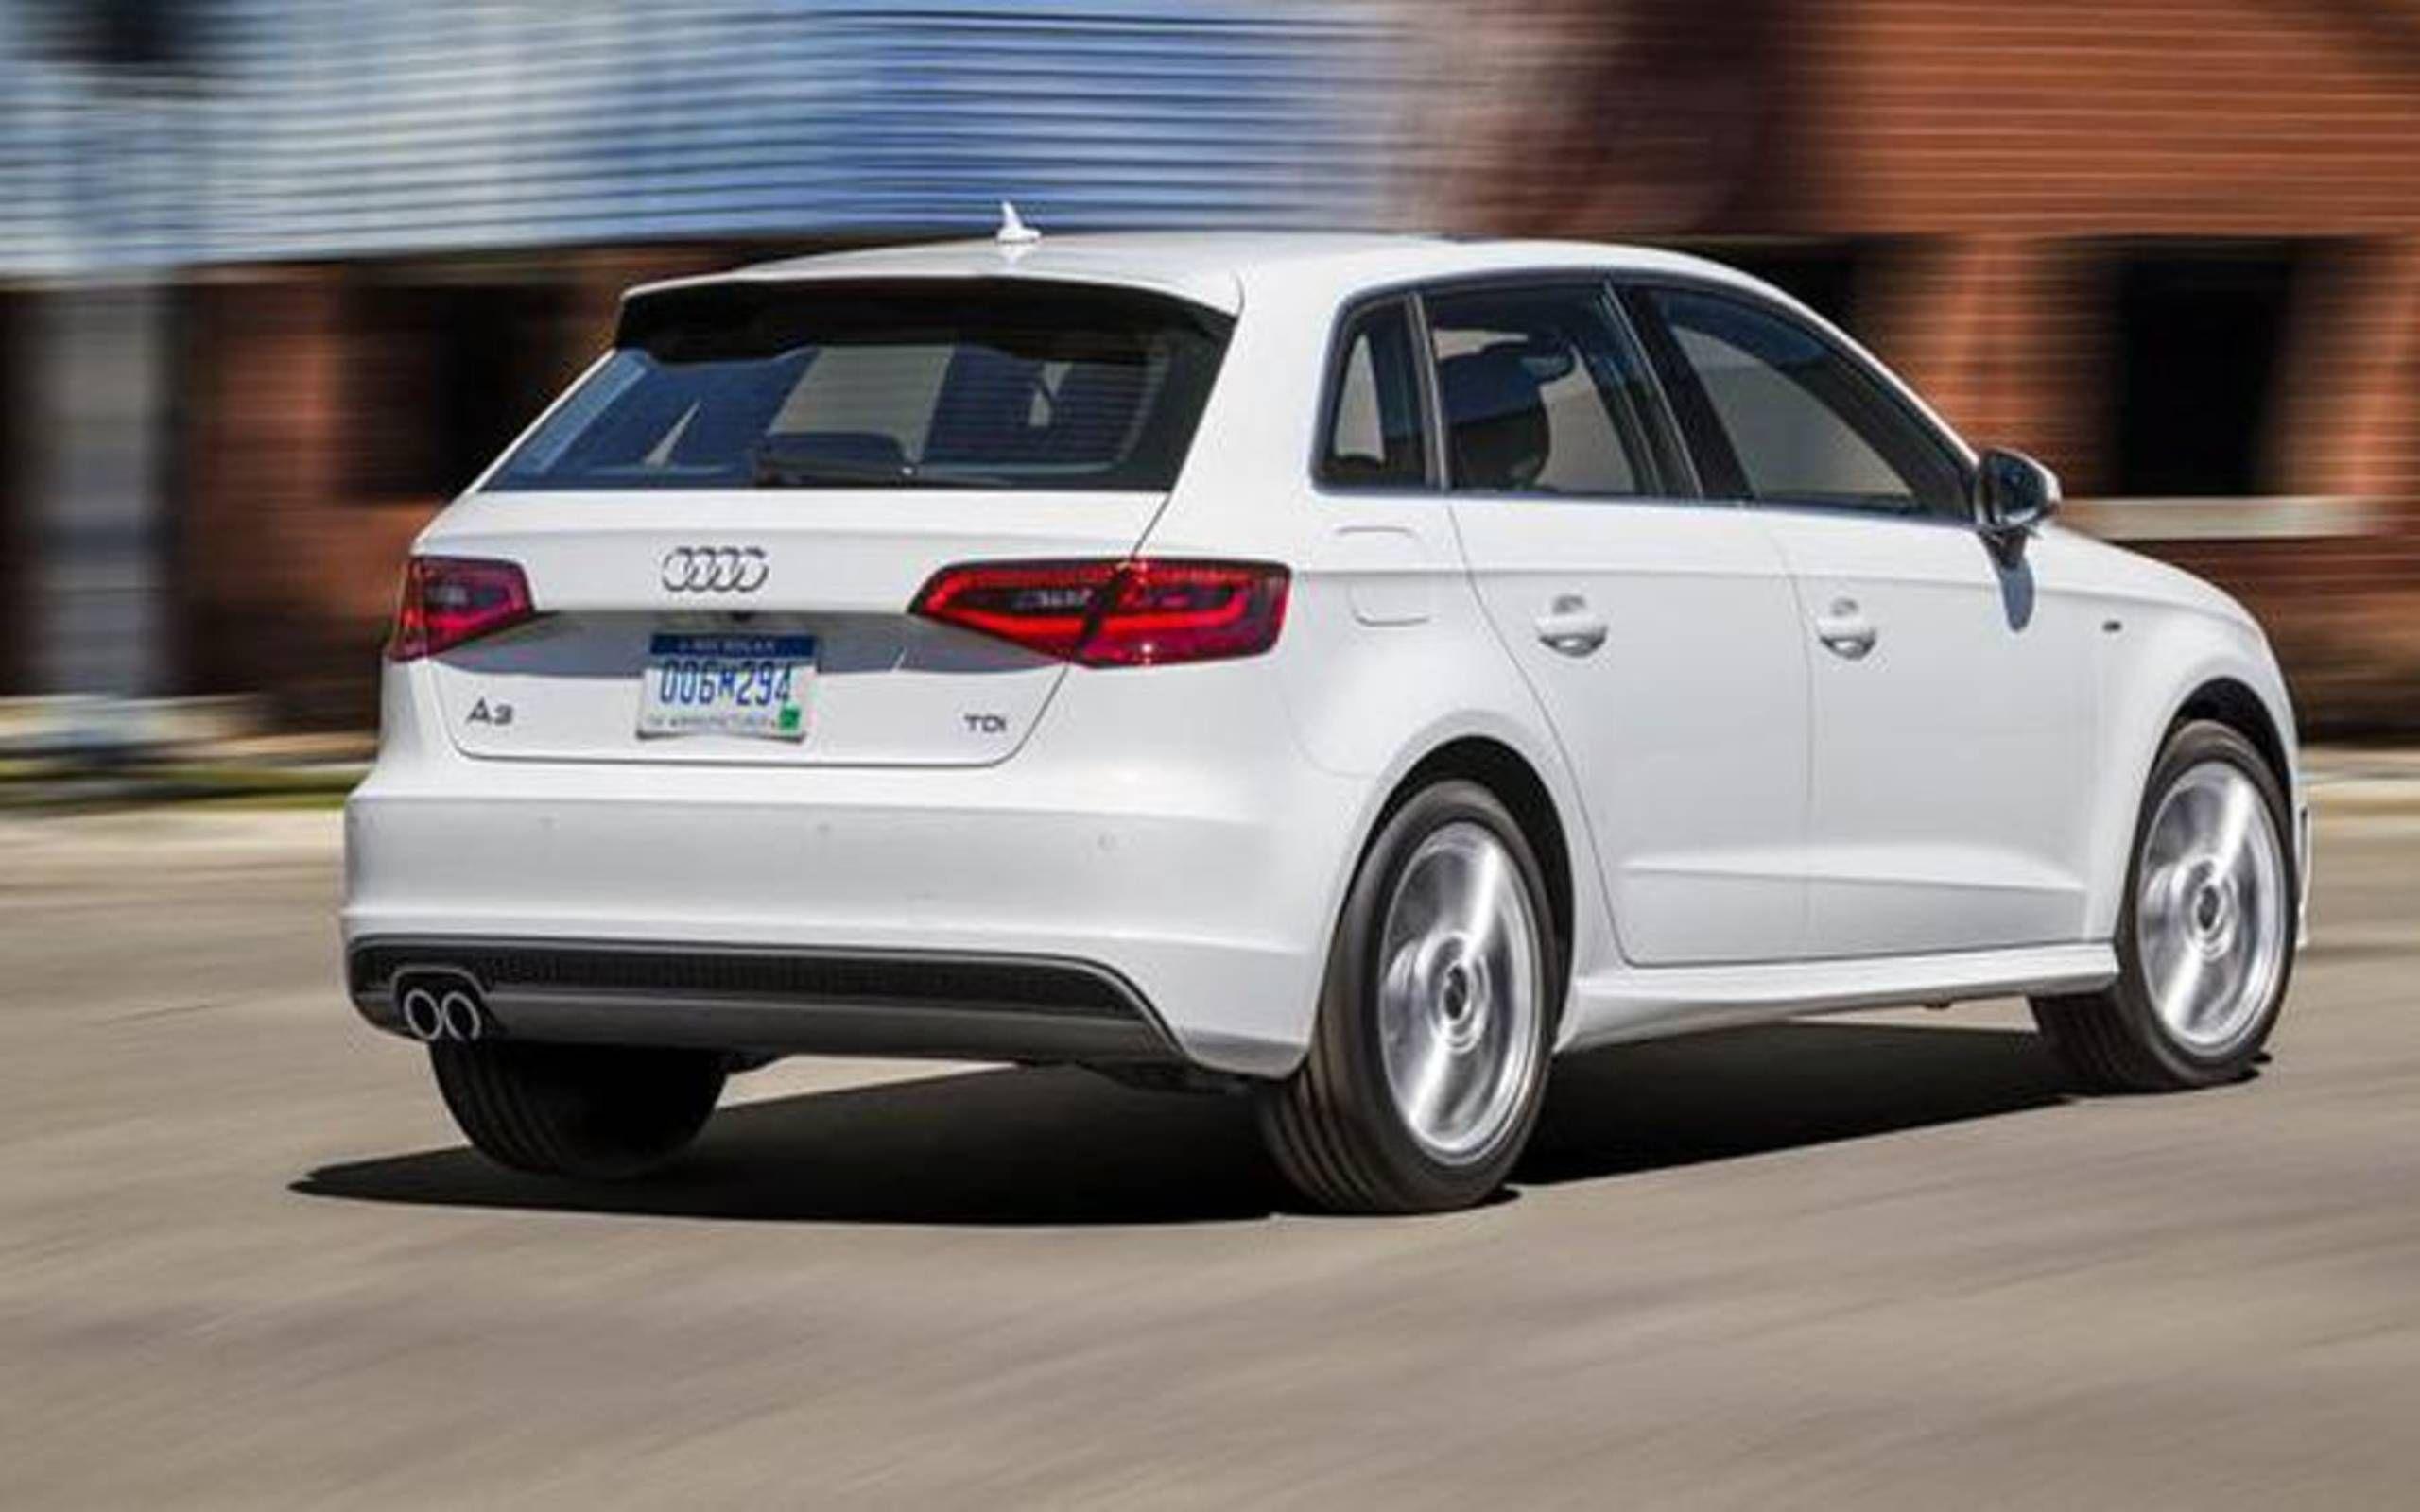 Kekurangan Audi A3 2015 Tangguh